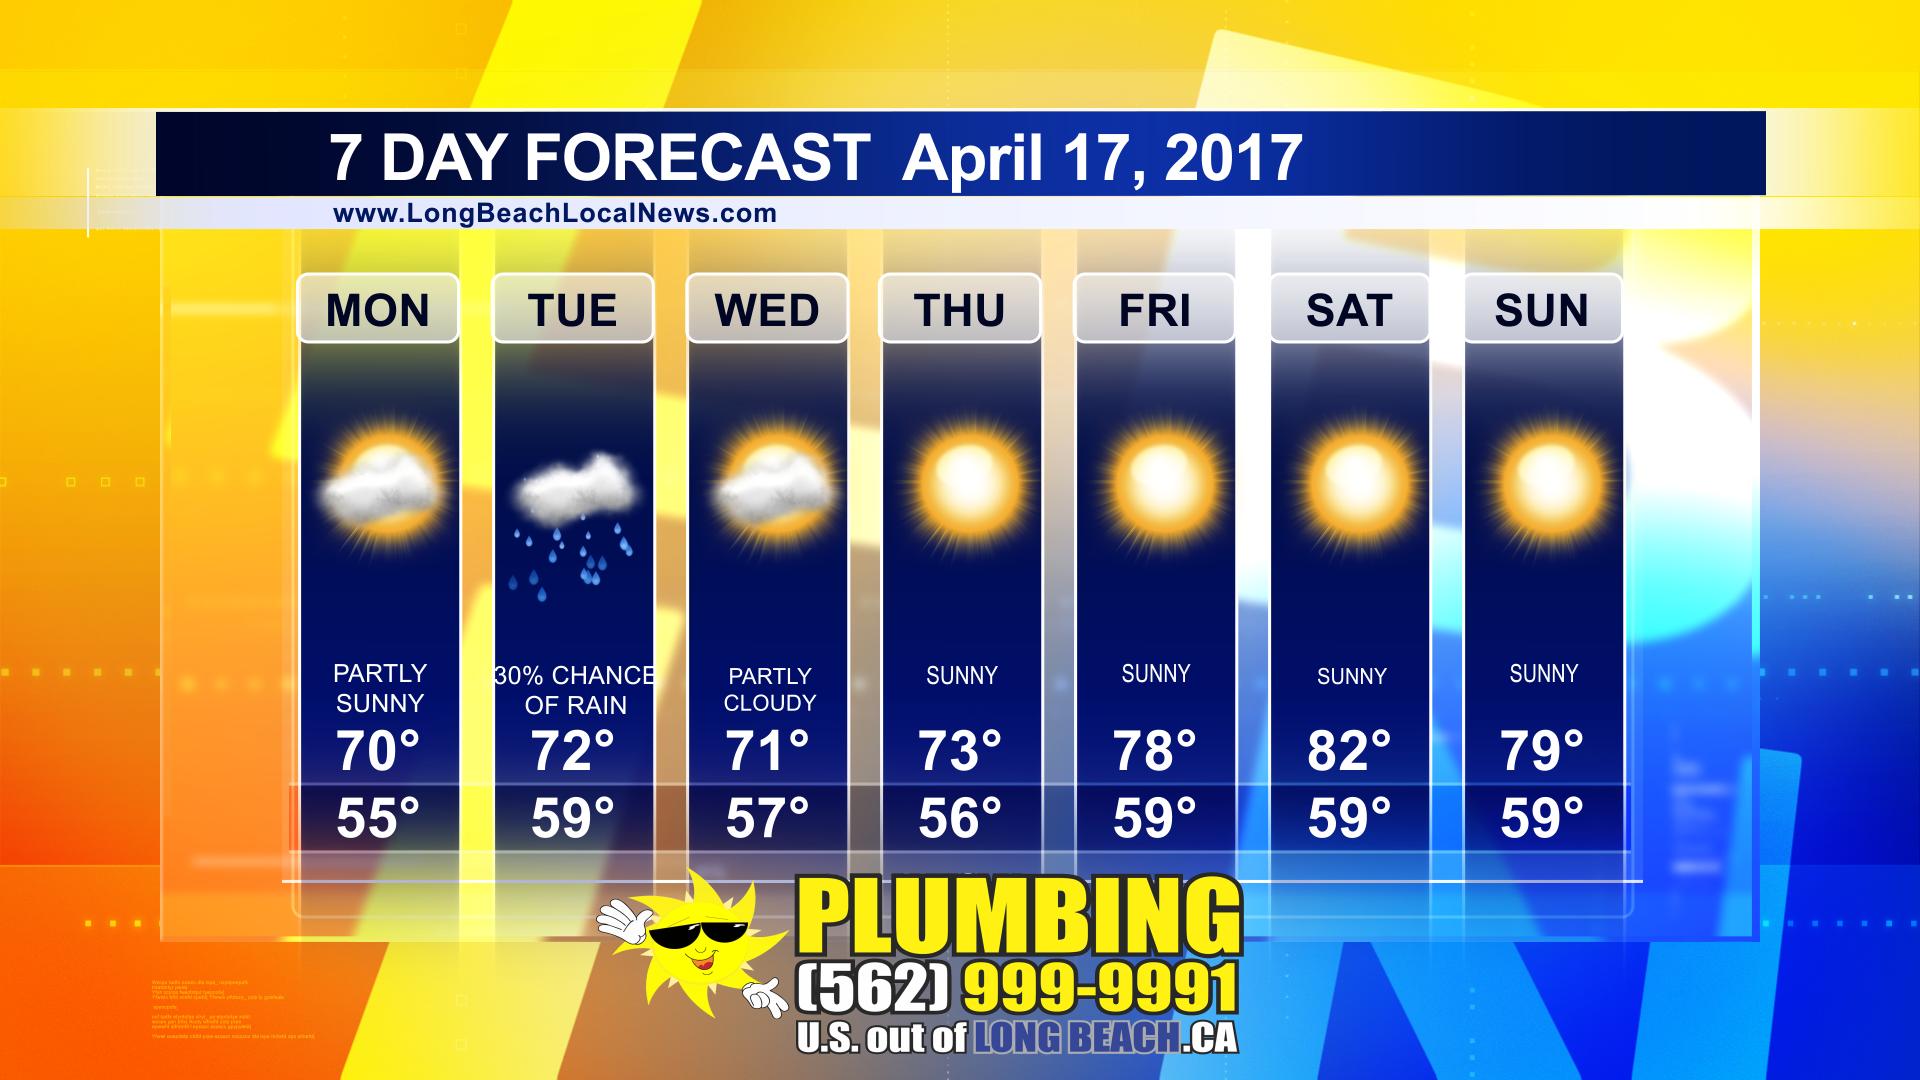 7 Day Forecast April 17 2017 Long Beach Local News